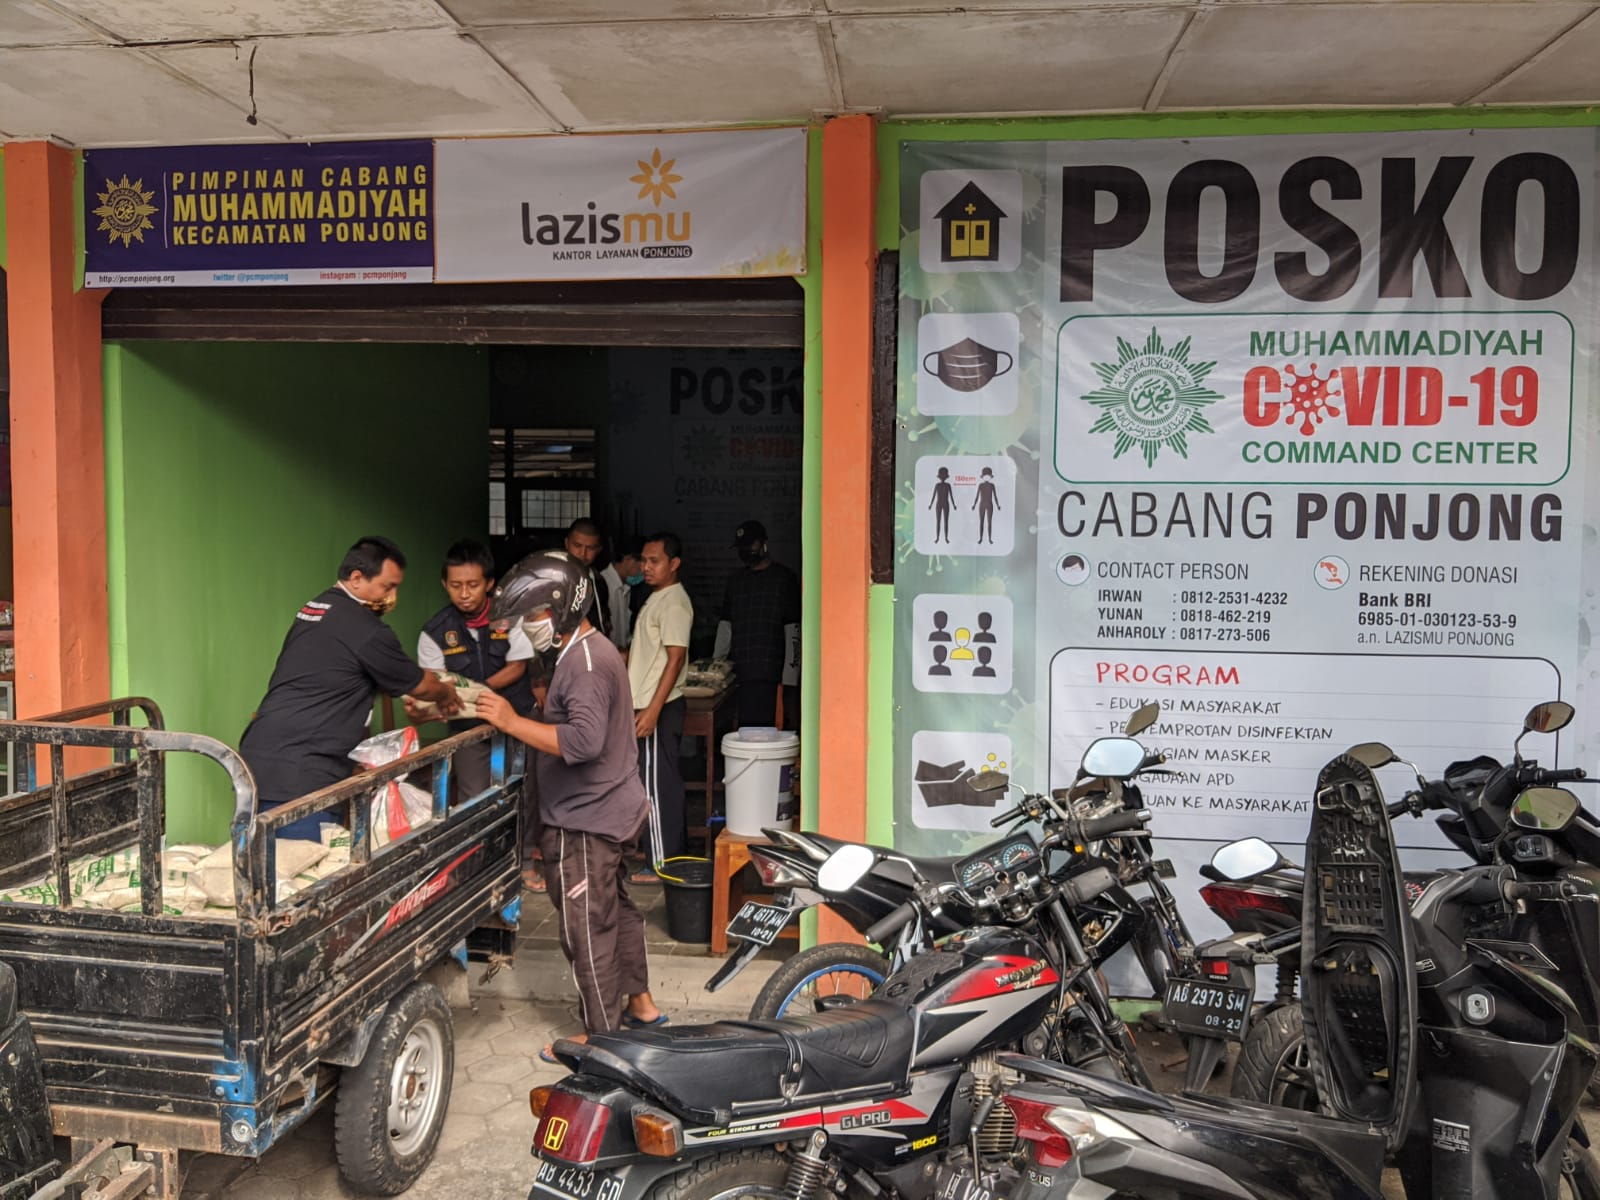 Proses Pembuatan Paket Sembako MCCC Cabang Ponjong